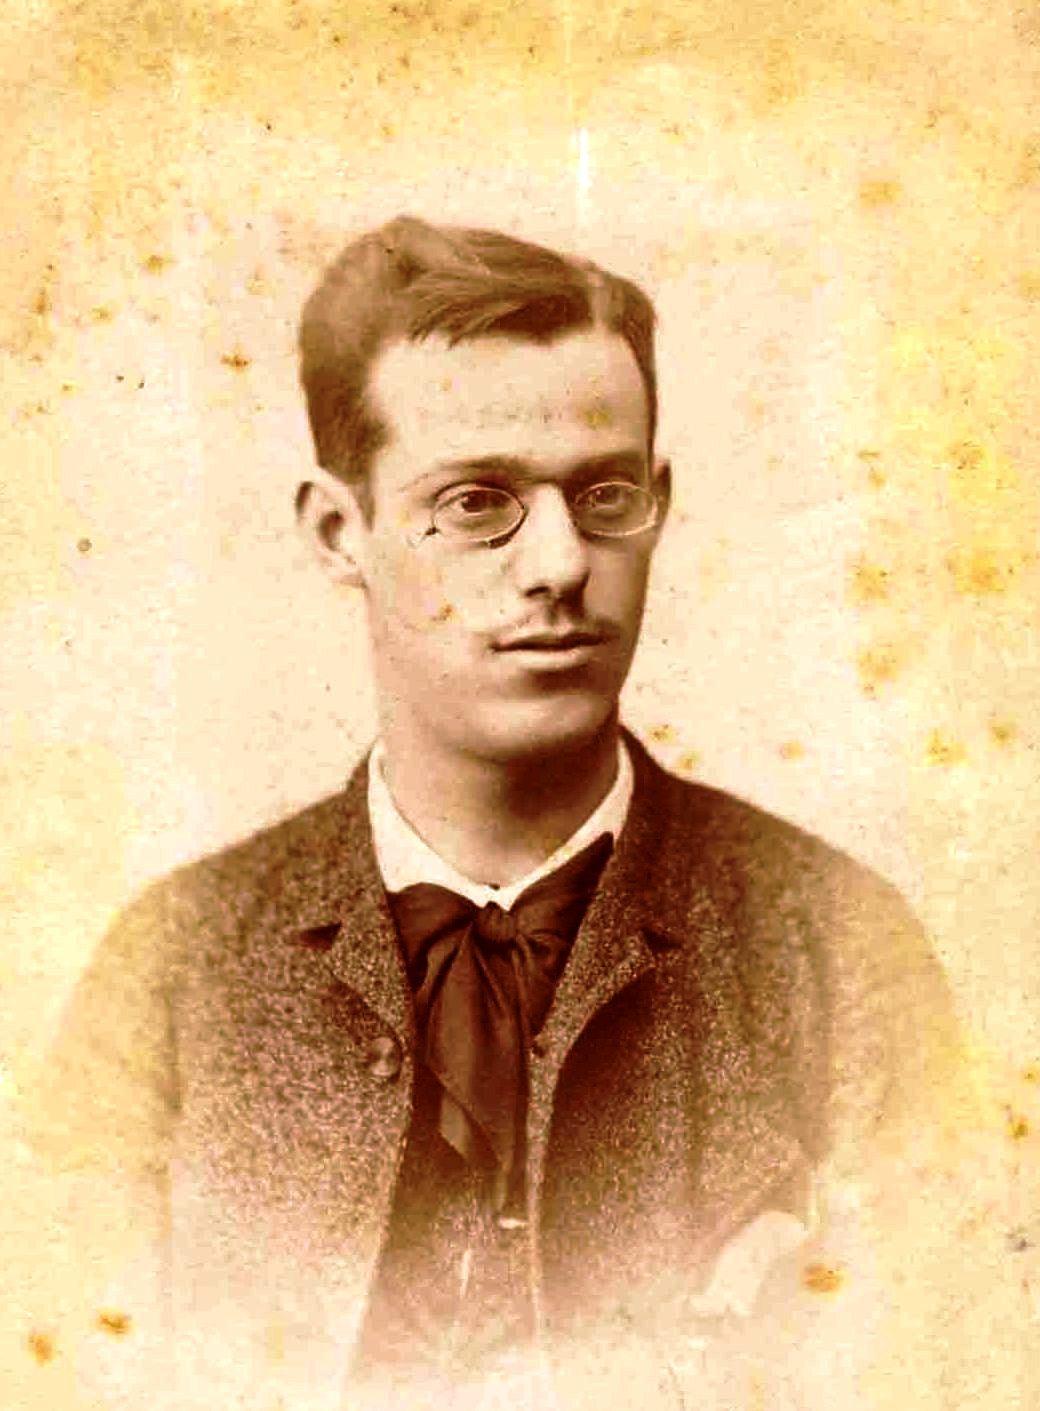 Odón de Buen (ca. 1886)